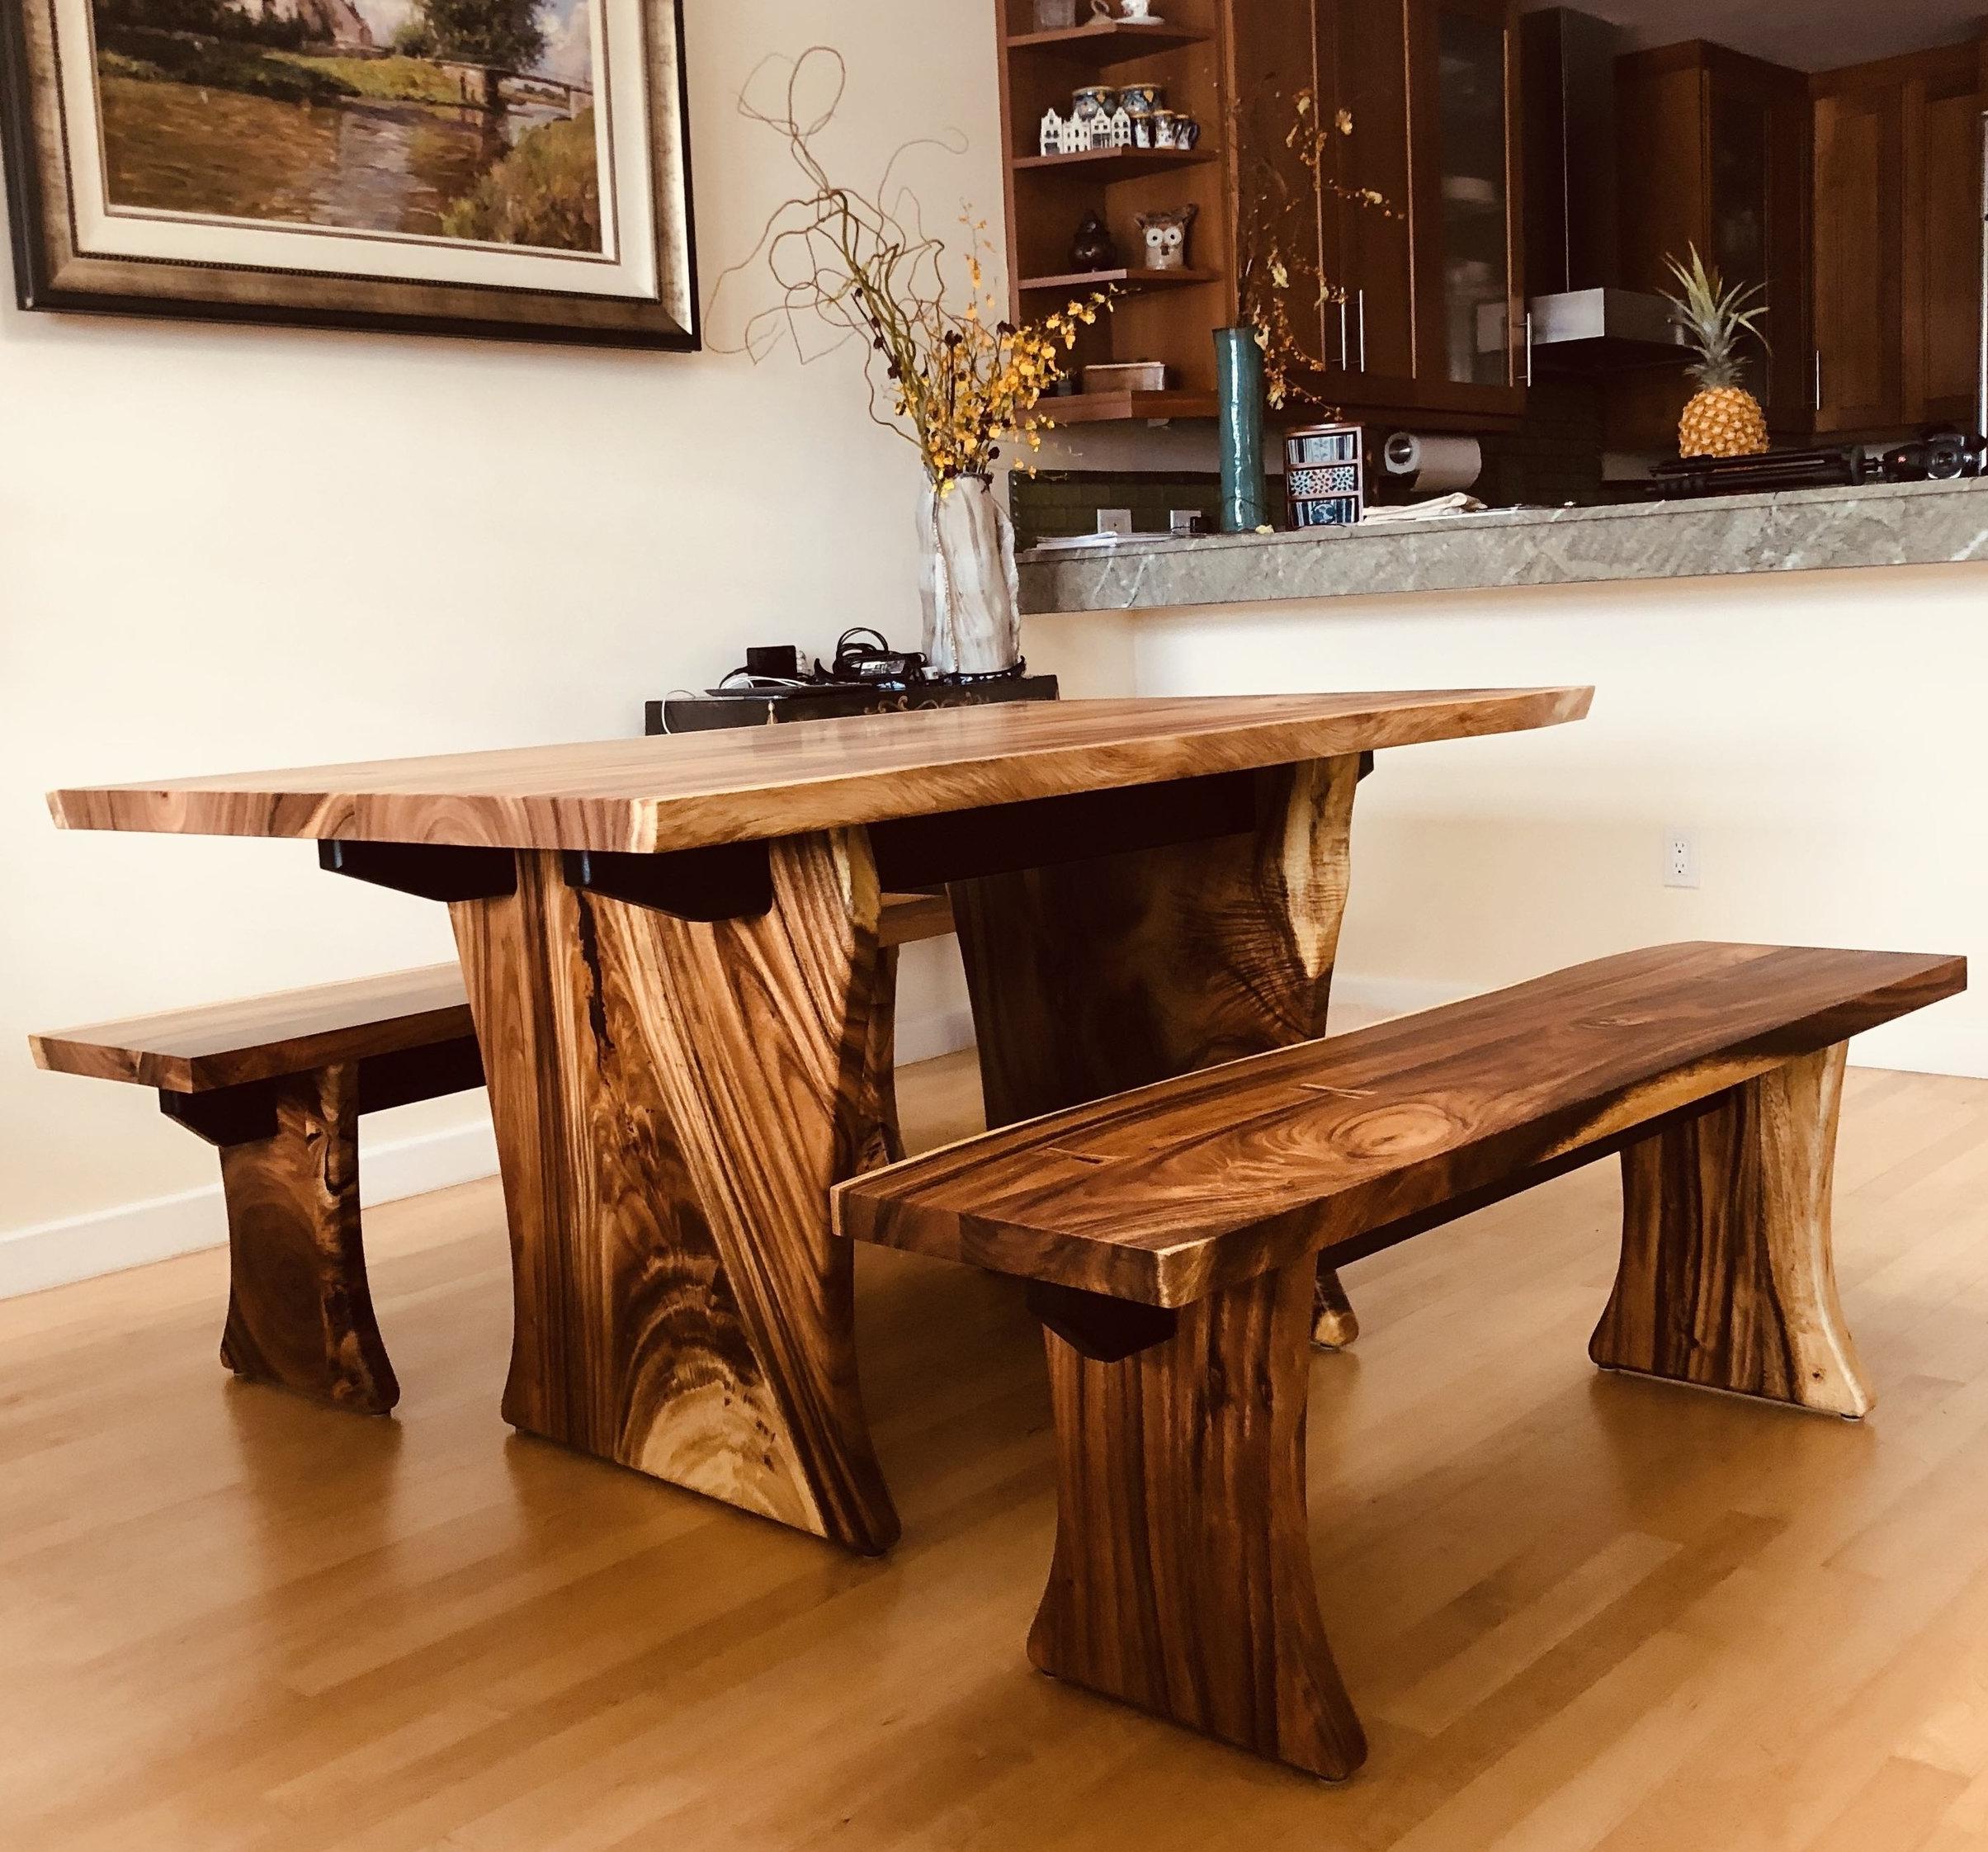 Ebonized oak stretchers for strength and contrast.